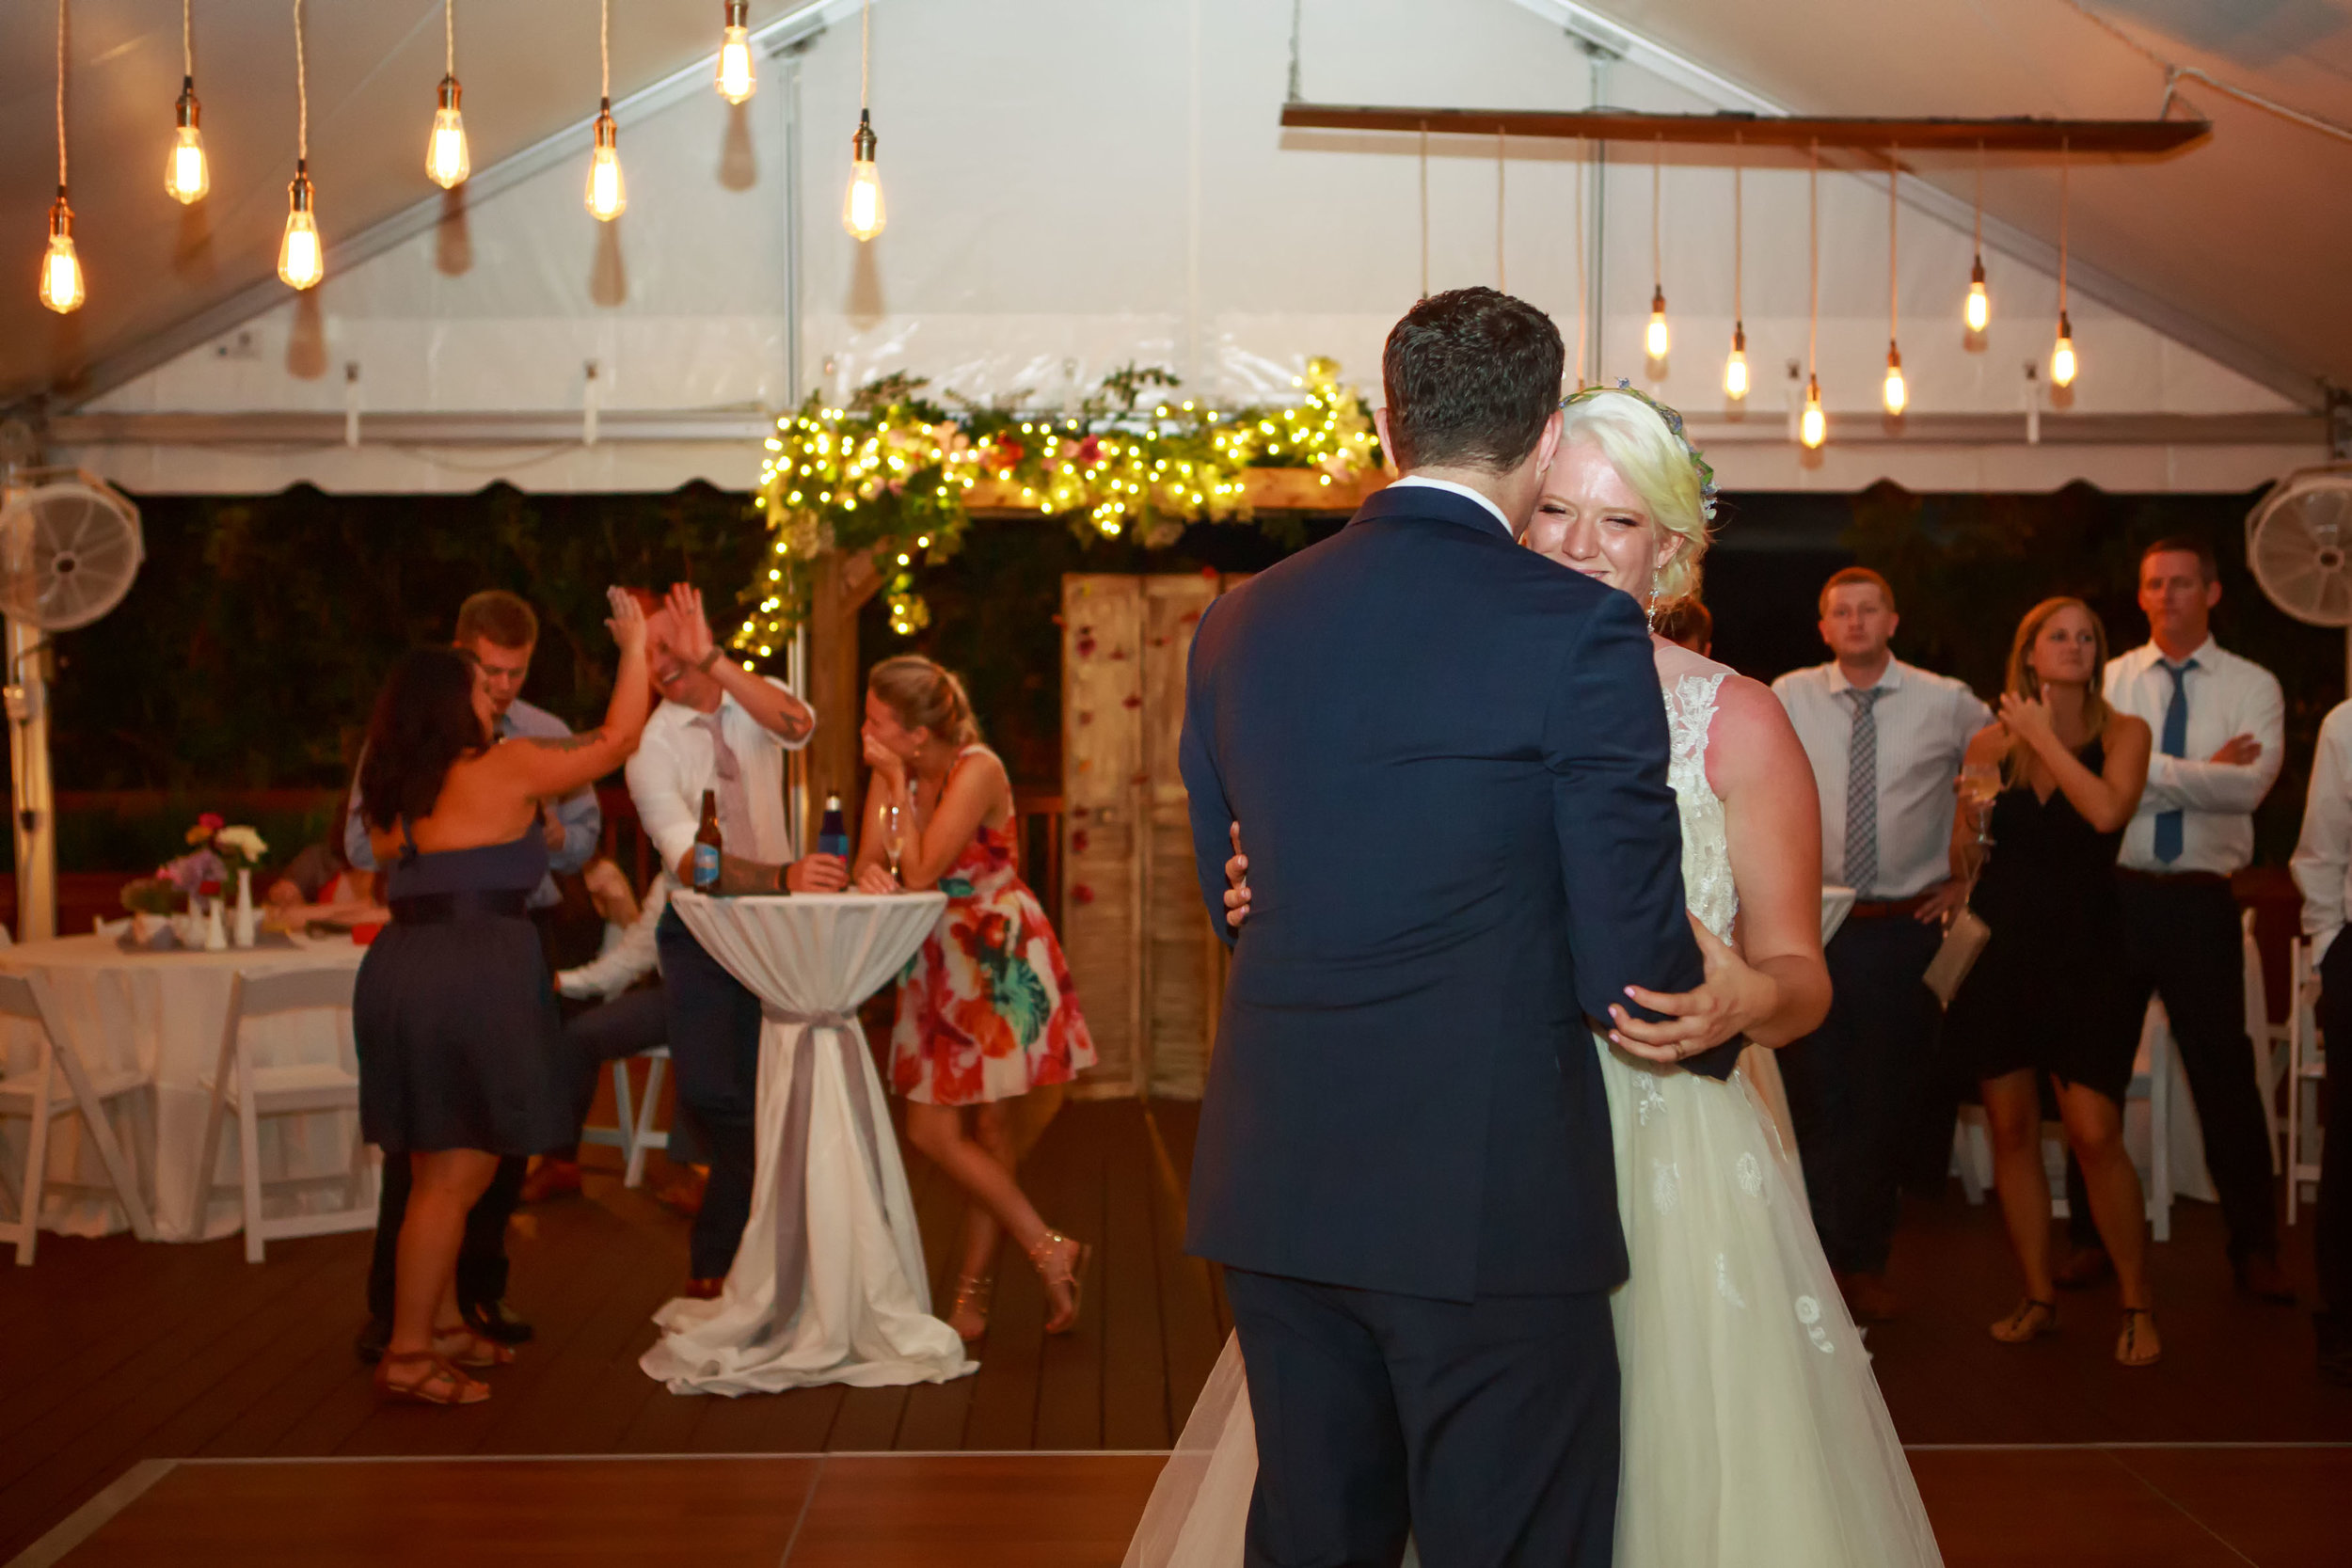 128-South-Wedding-Wilmington-NC-Photographer-Reception-141.jpg